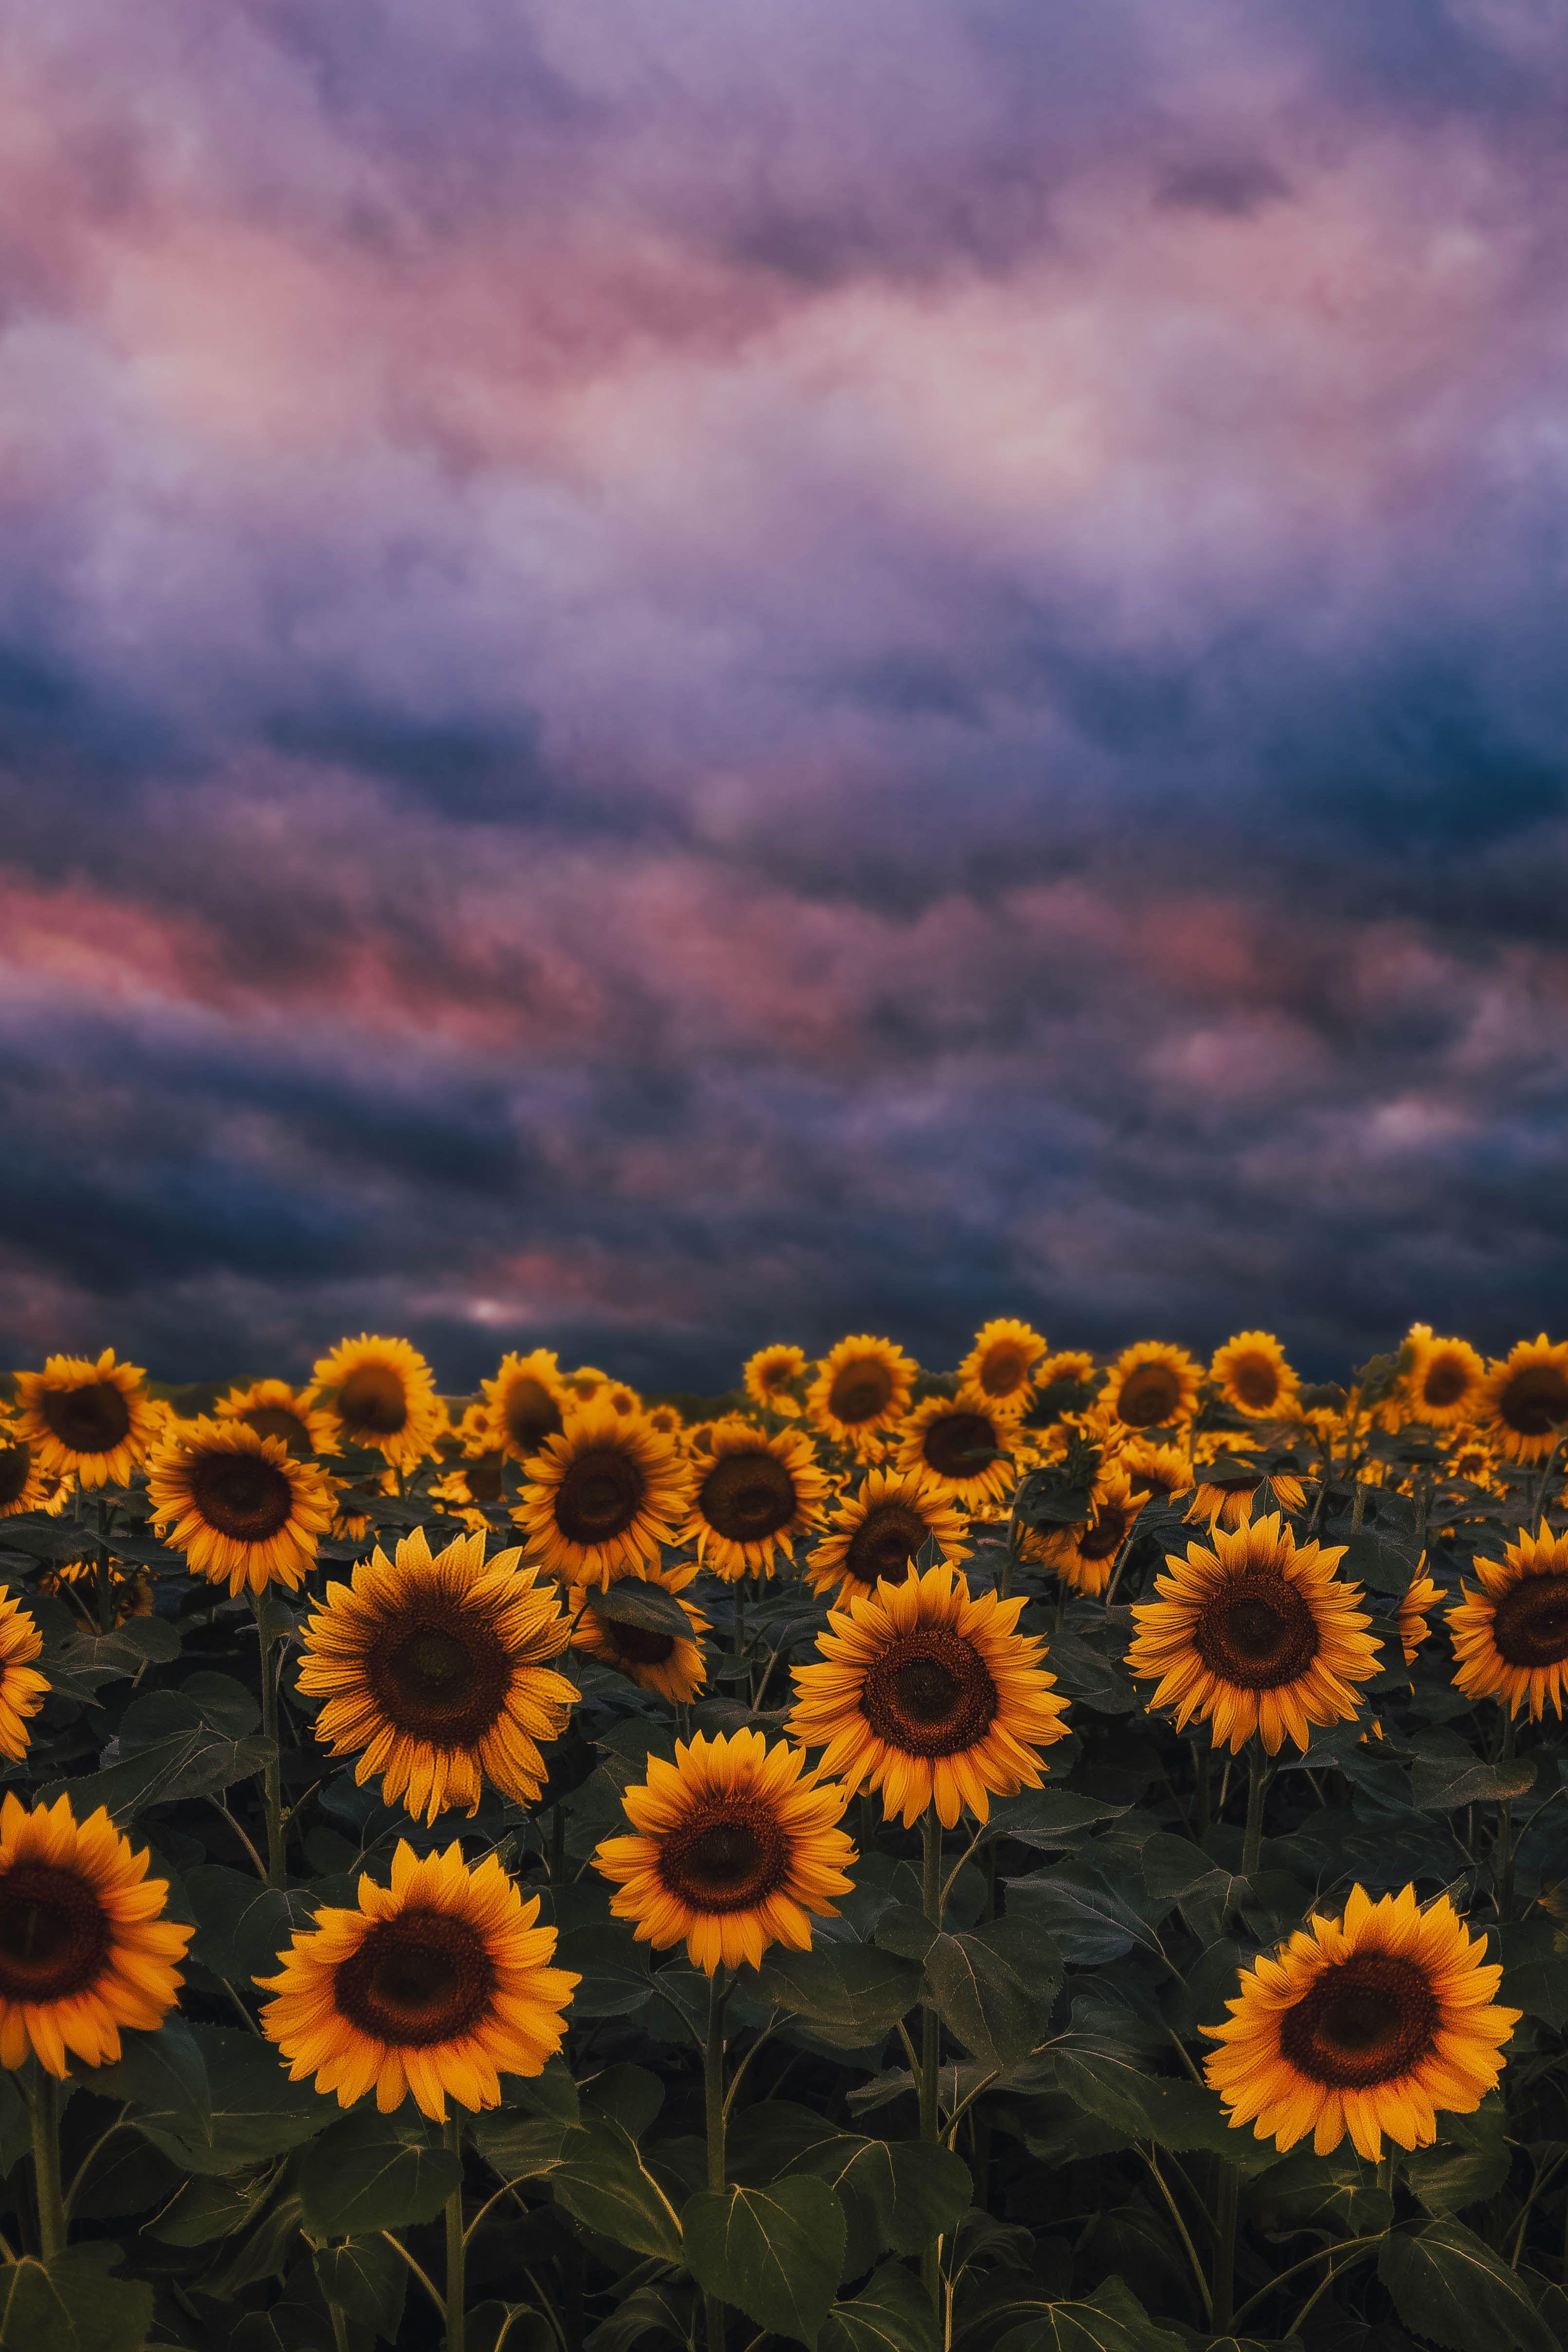 Wallpaper Aesthetic Sunflower Wallpaper Beautiful Photos Of Nature Nature Photography